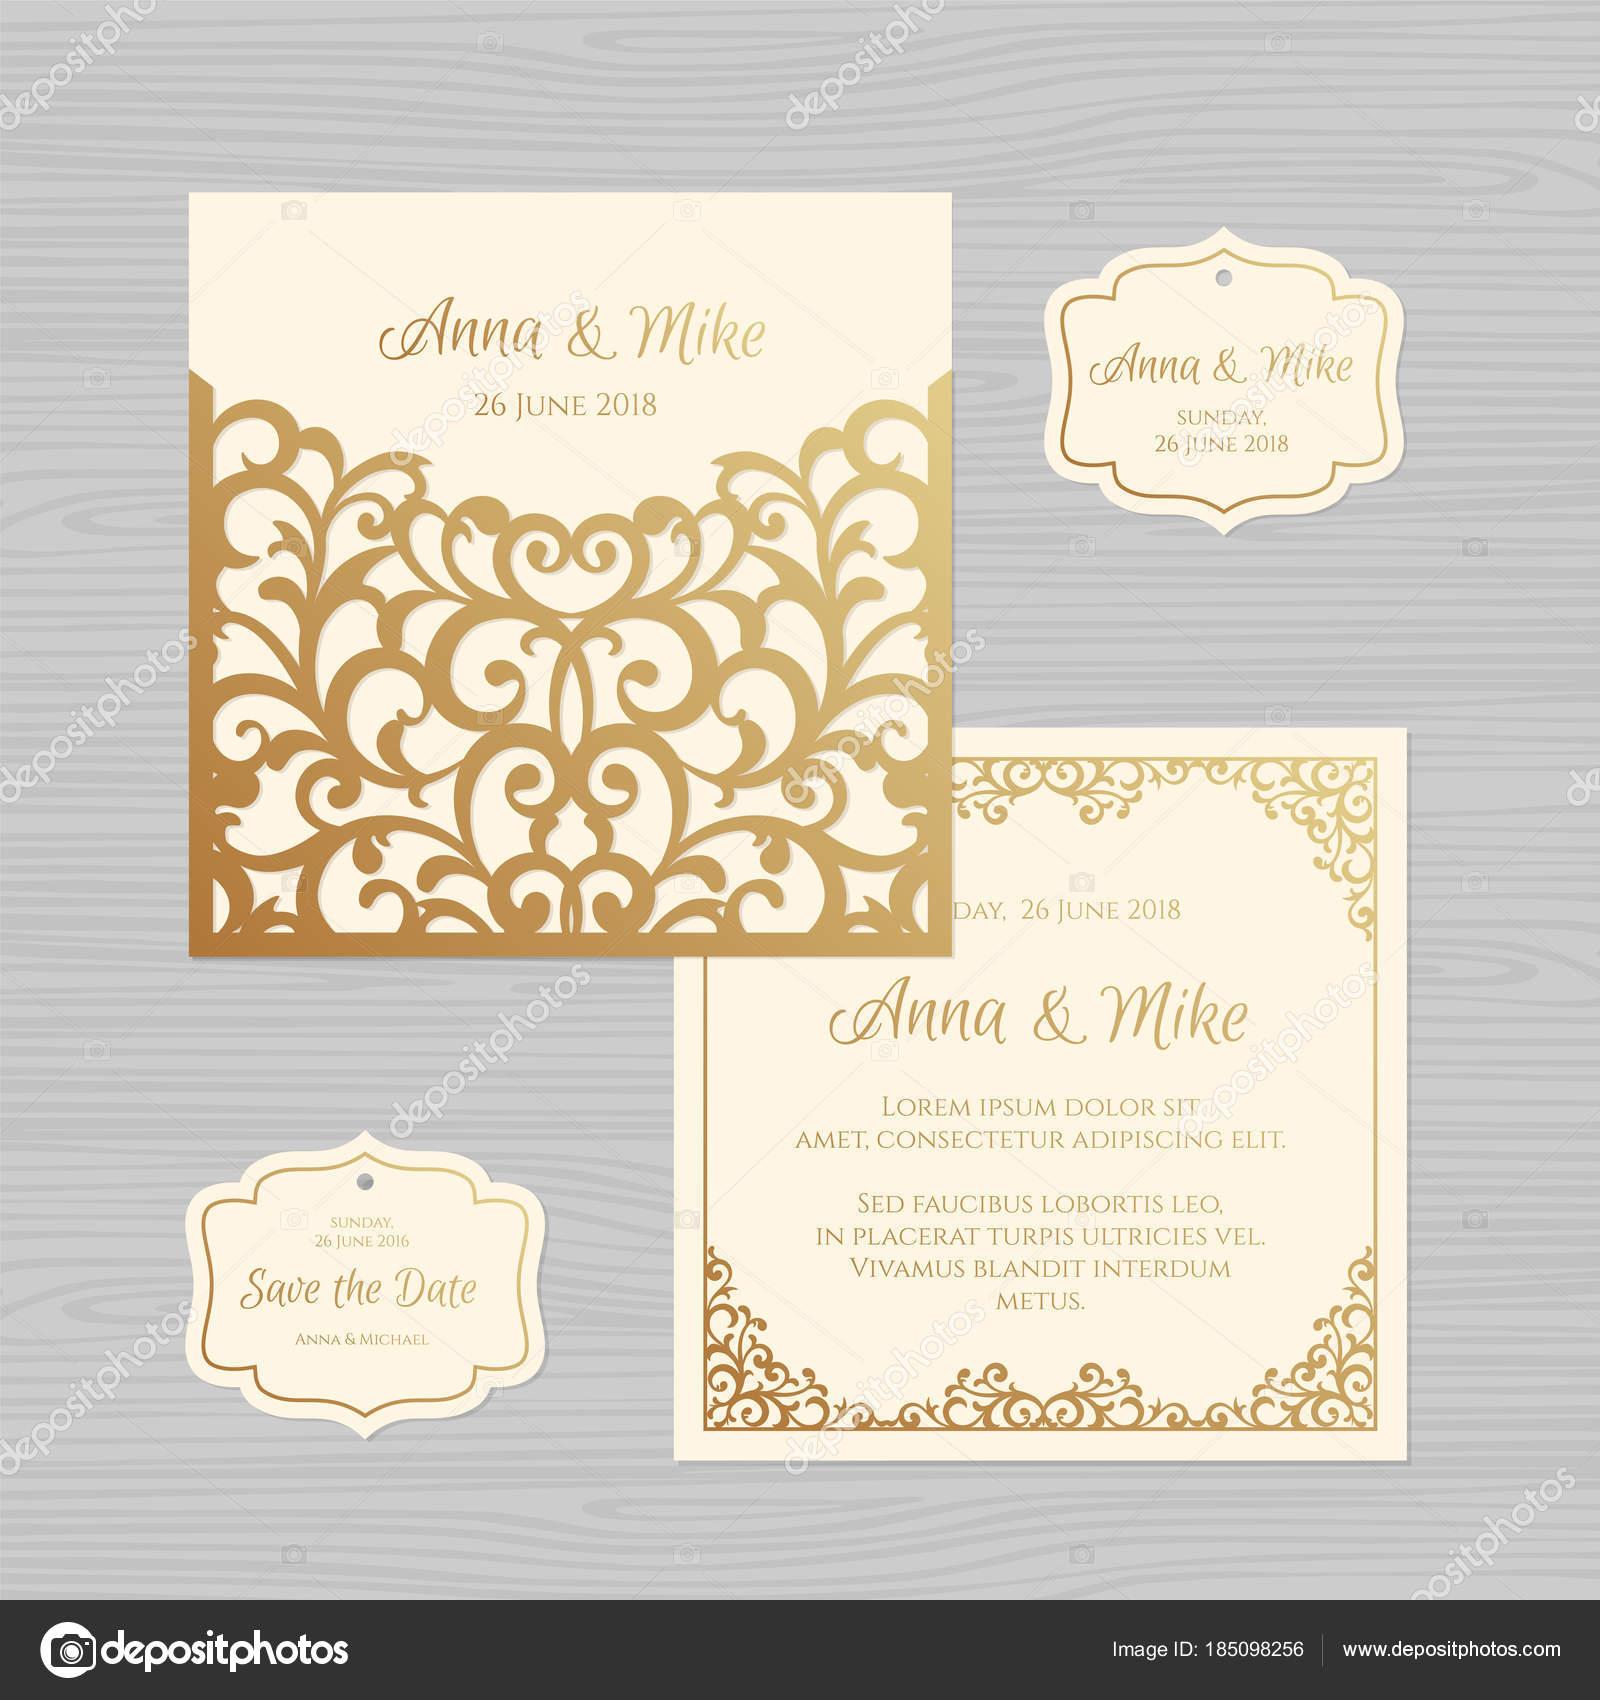 Wedding invitation or greeting card with vintage ornament paper wedding invitation or greeting card with vintage ornament paper lace envelope template wedding invitation m4hsunfo